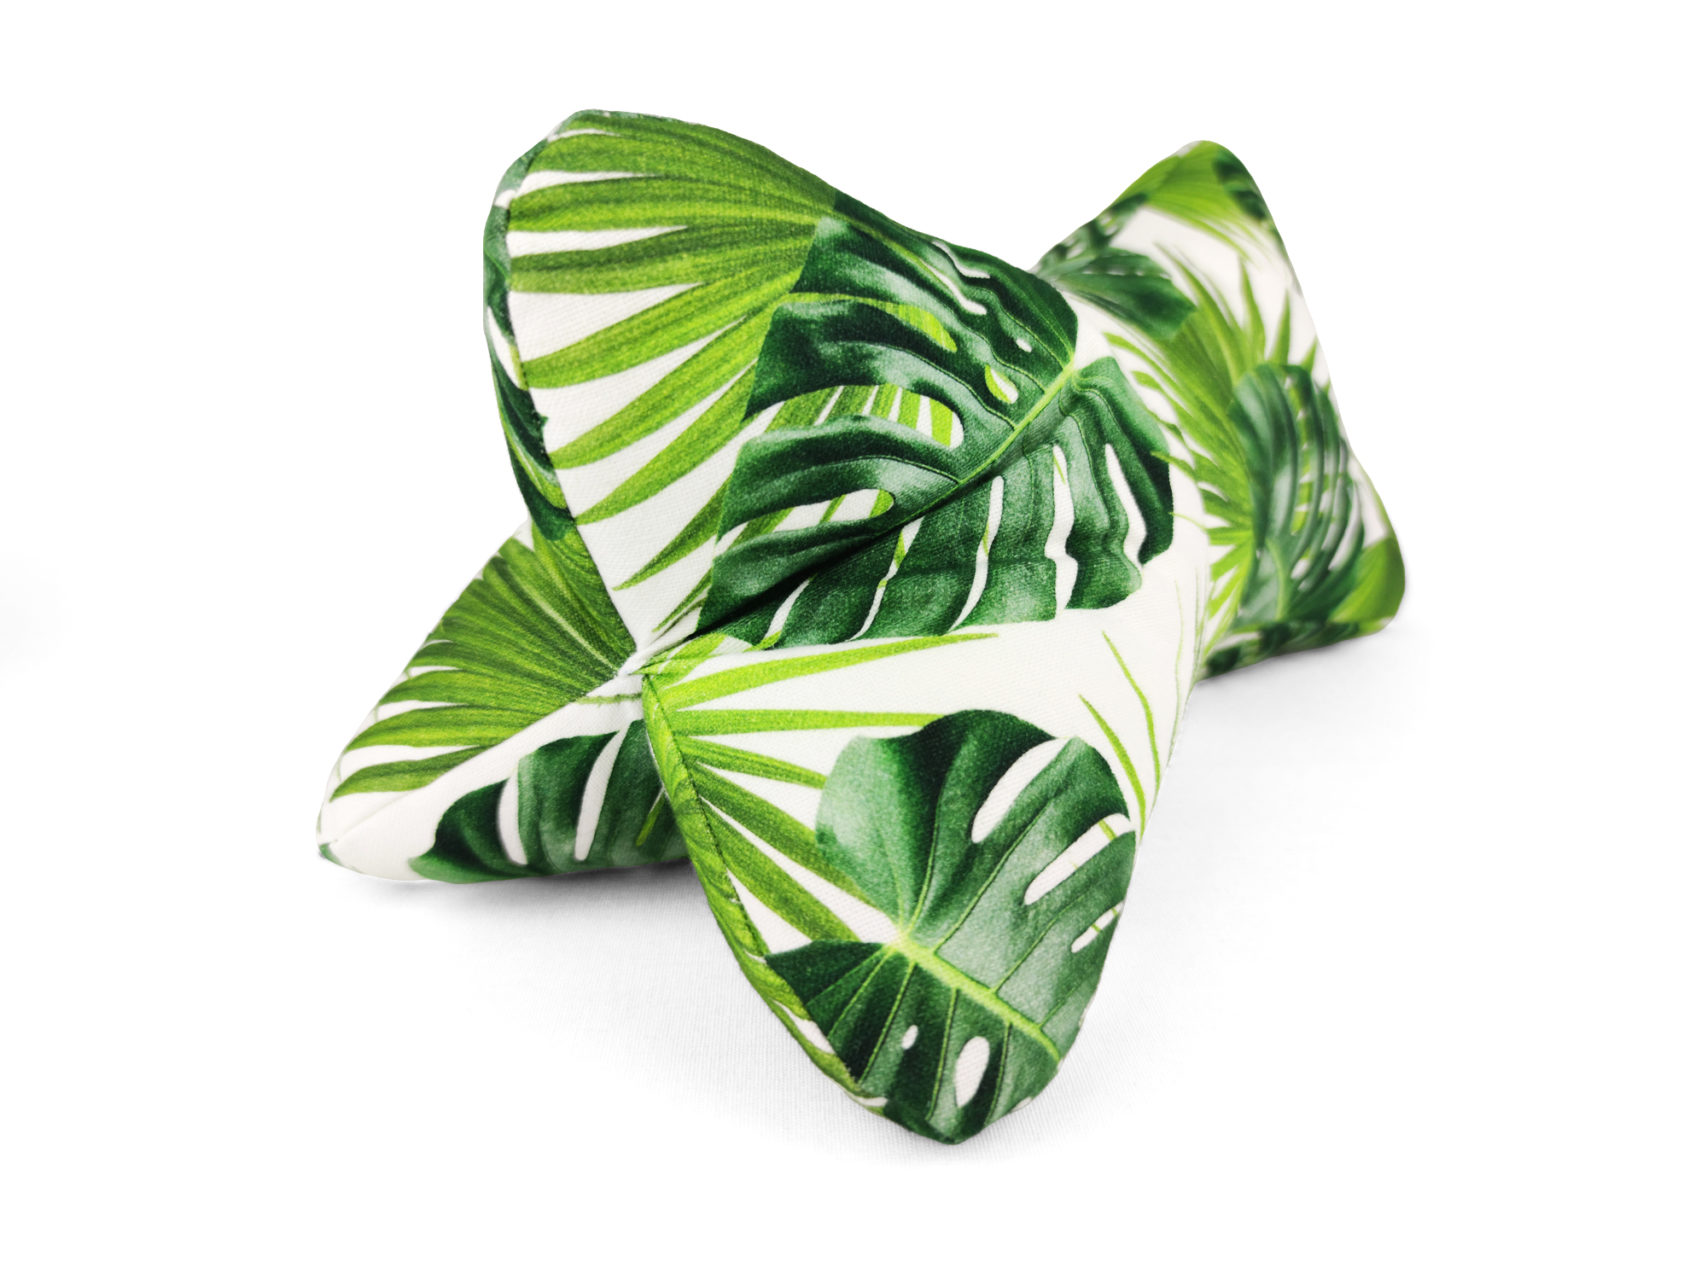 Leseknochen living green grüne Monstera Blätter